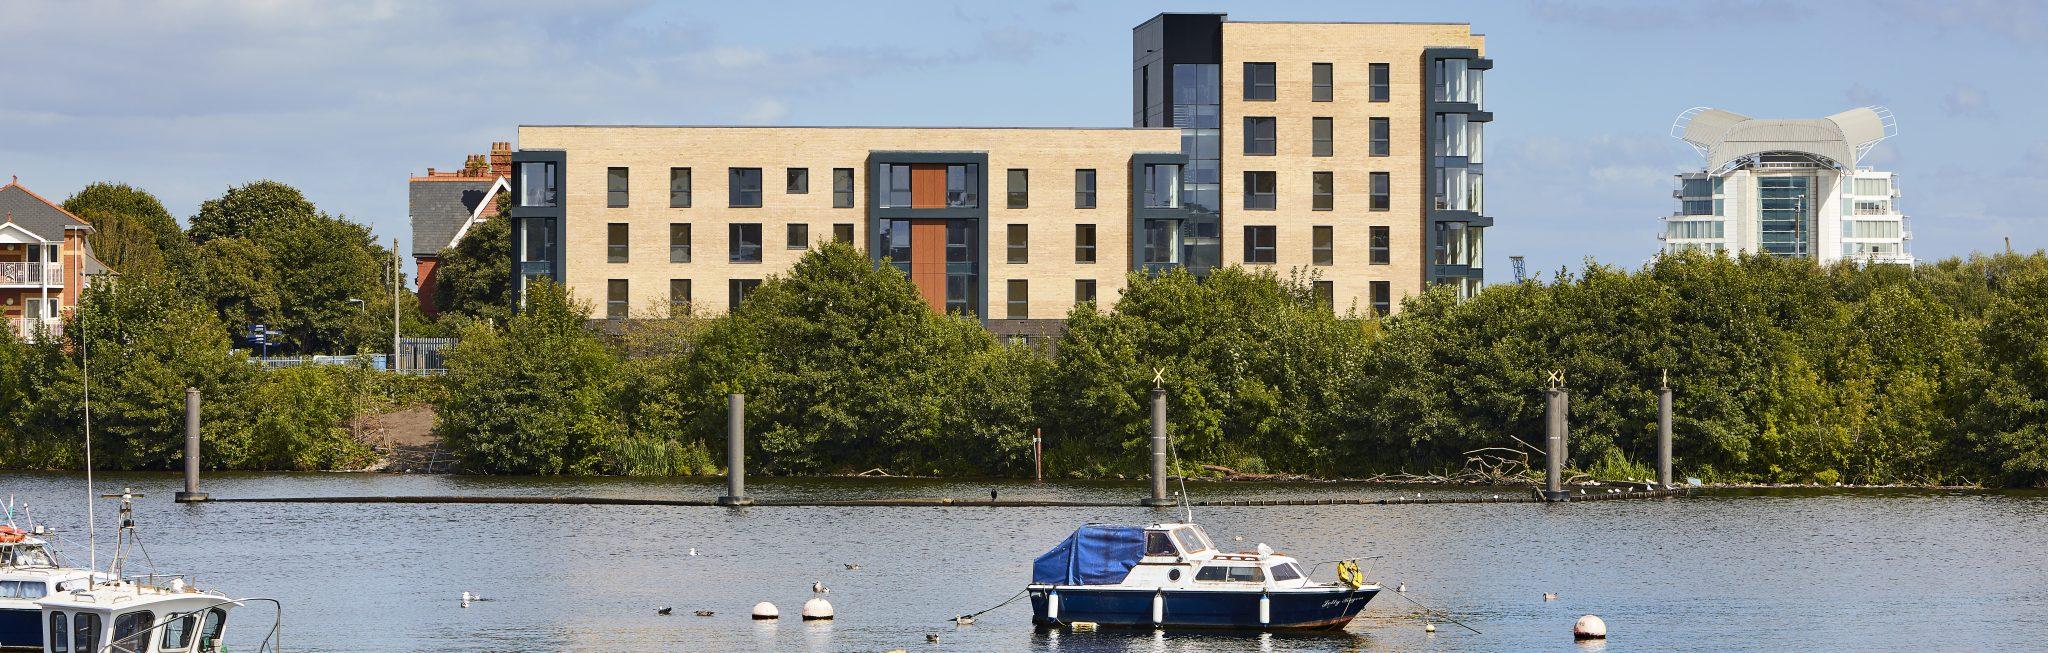 Hamadryad Residential Development Cardiff